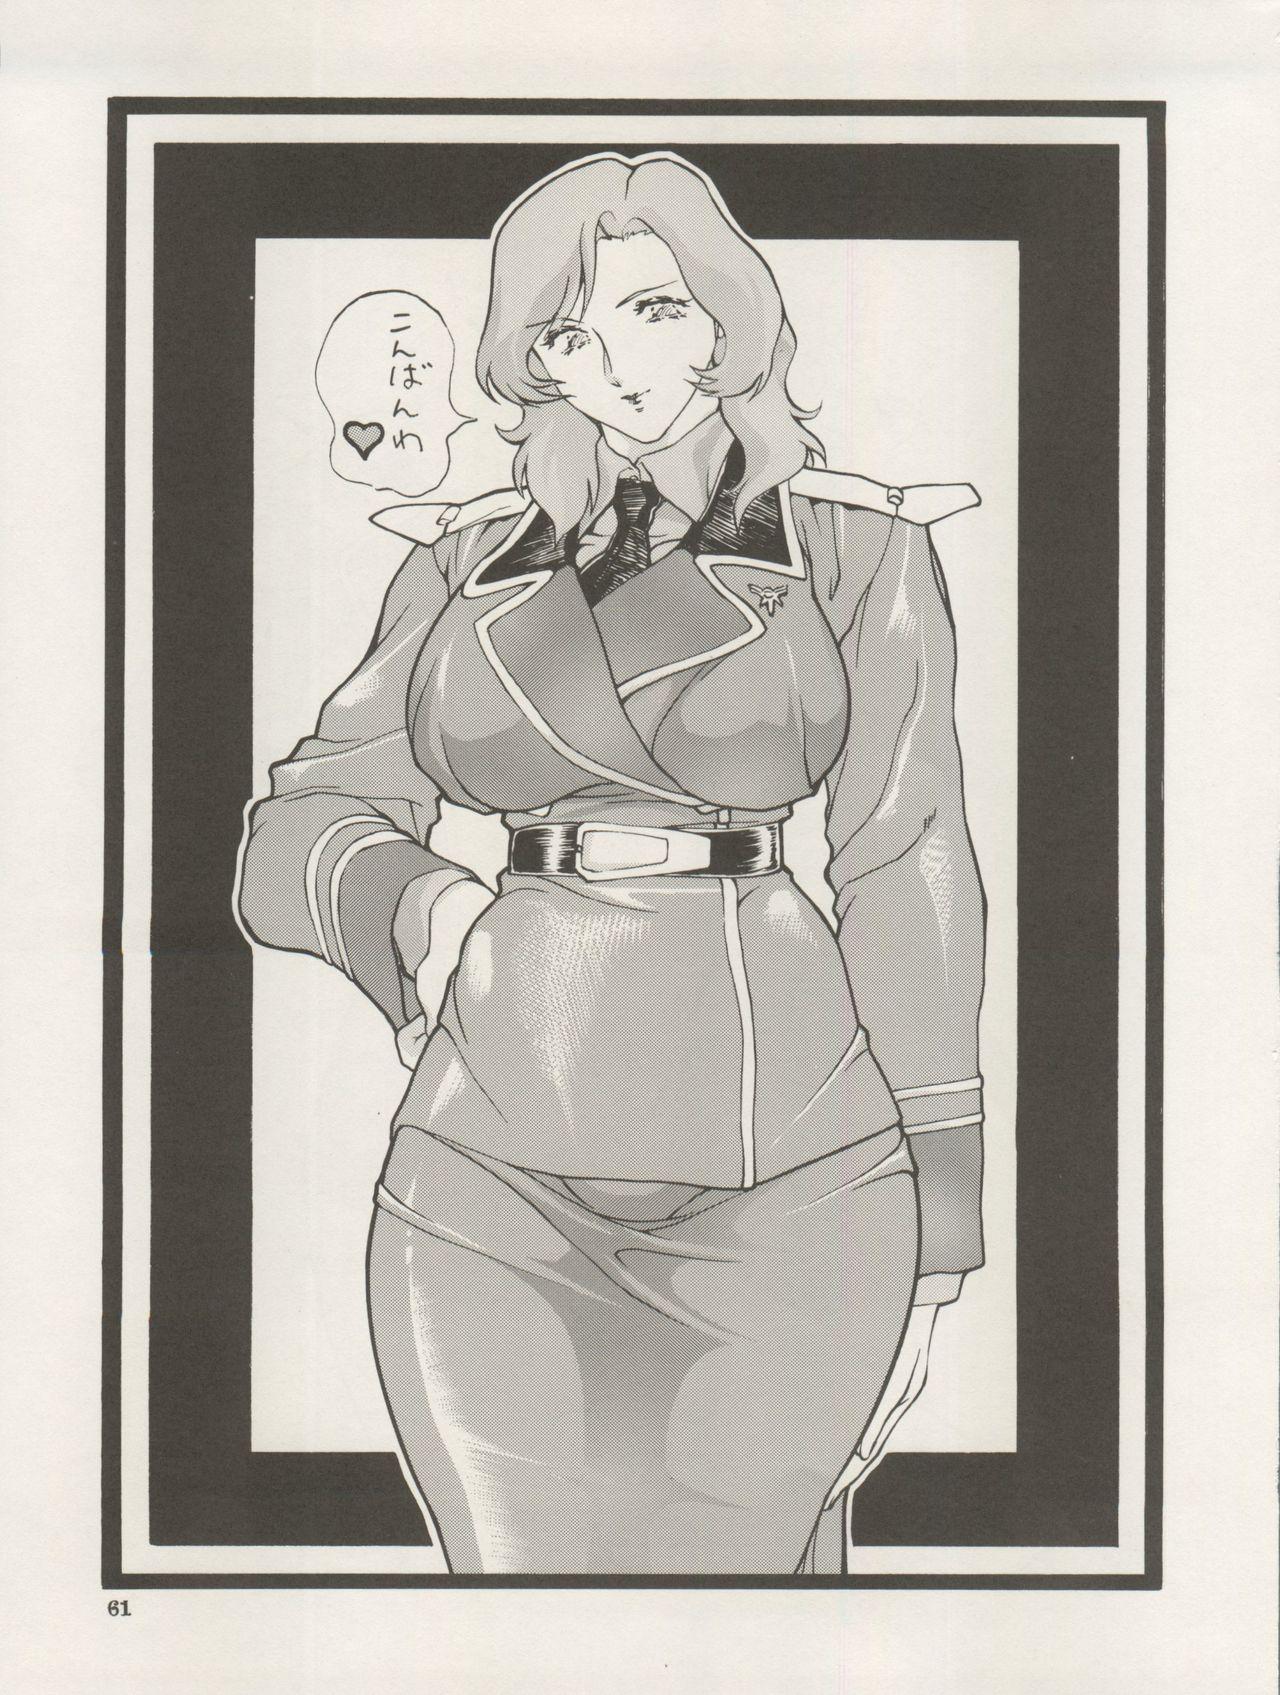 NEXT Climax Magazine 3 Gundam Series 60